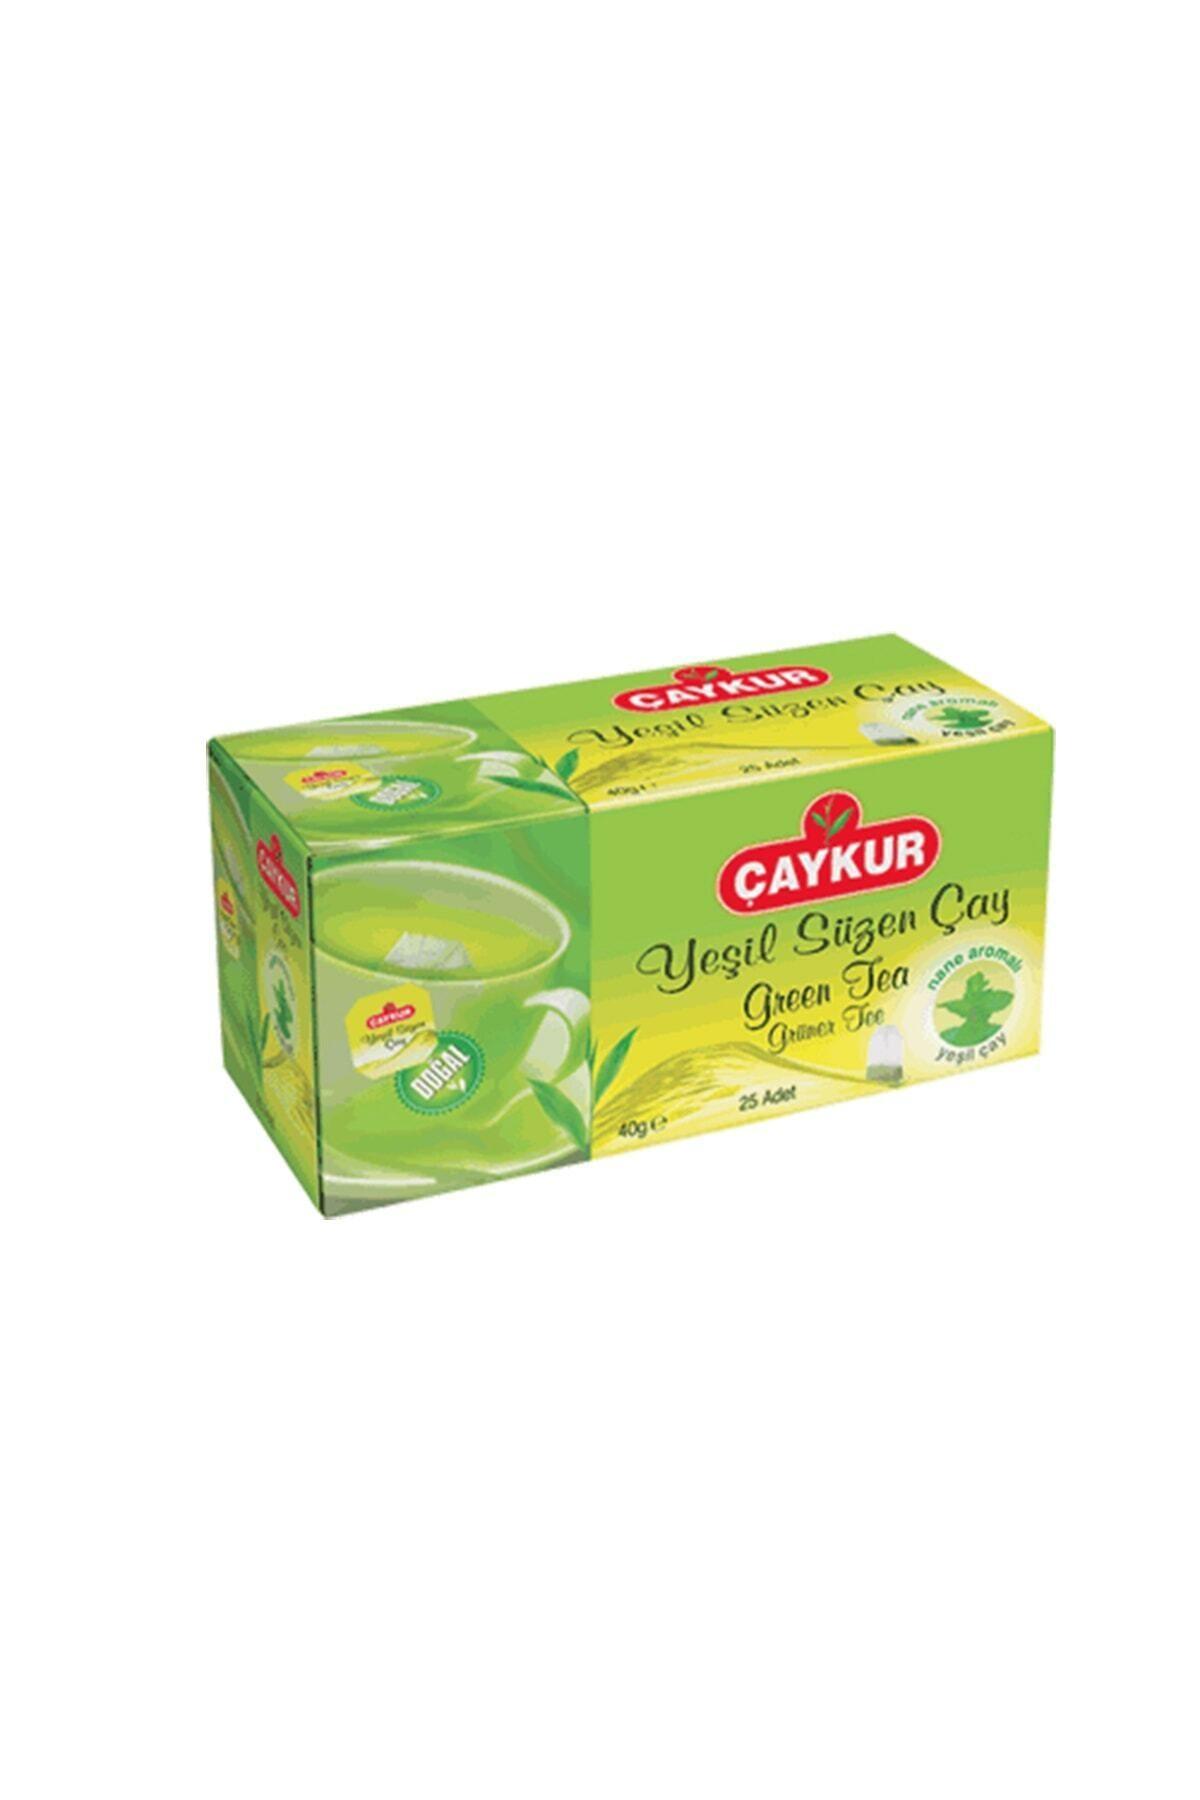 CAYKUR YESIL CAY NANELI(GREEN TEA) 40 GR